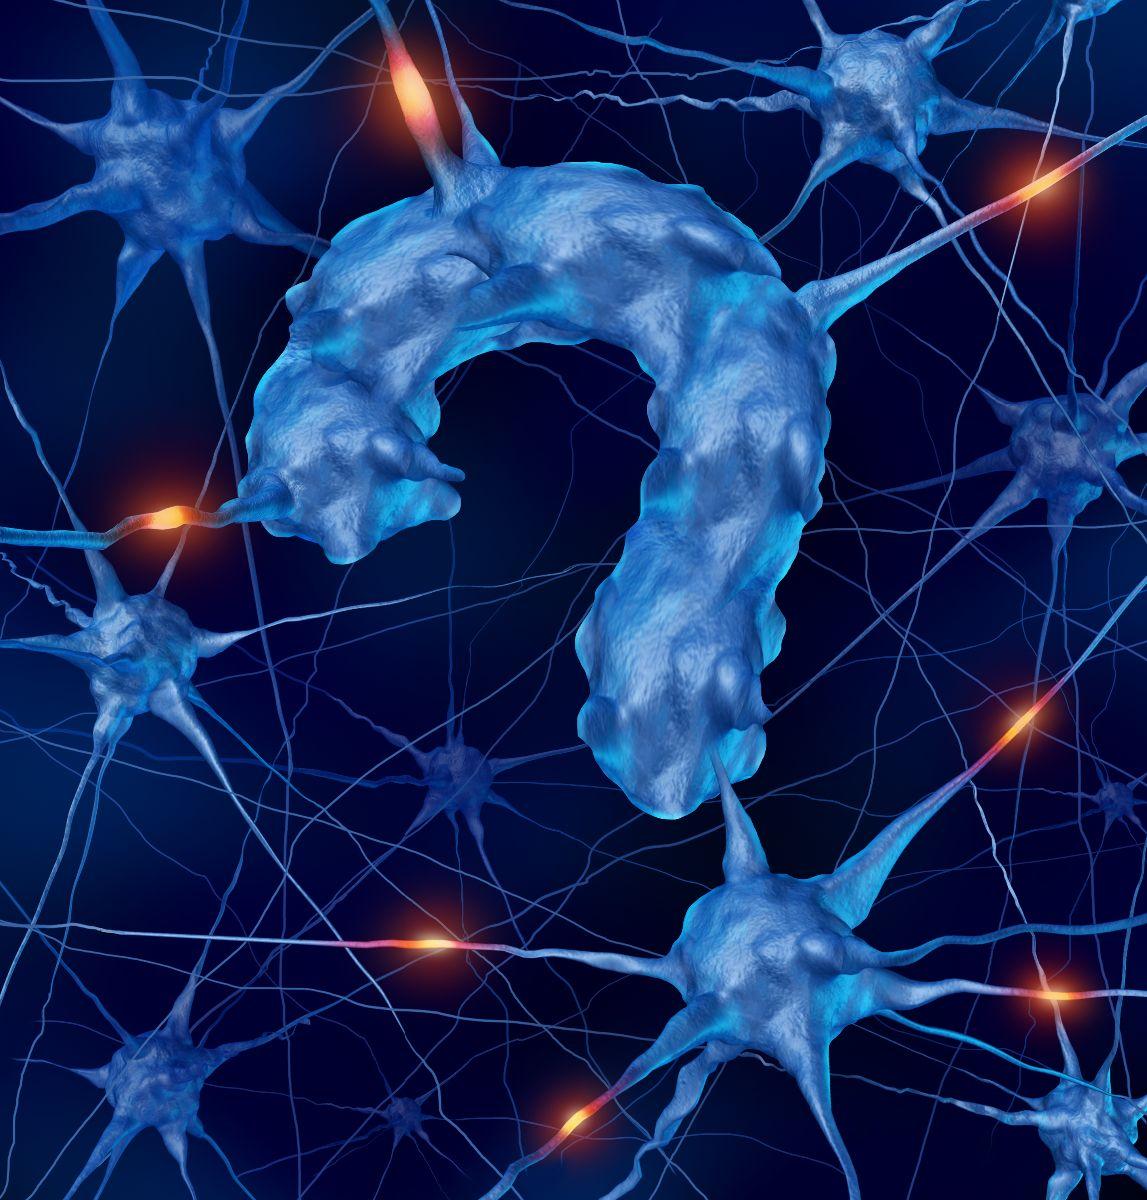 Neurona en forma de signo de interrogación en un fondo azil